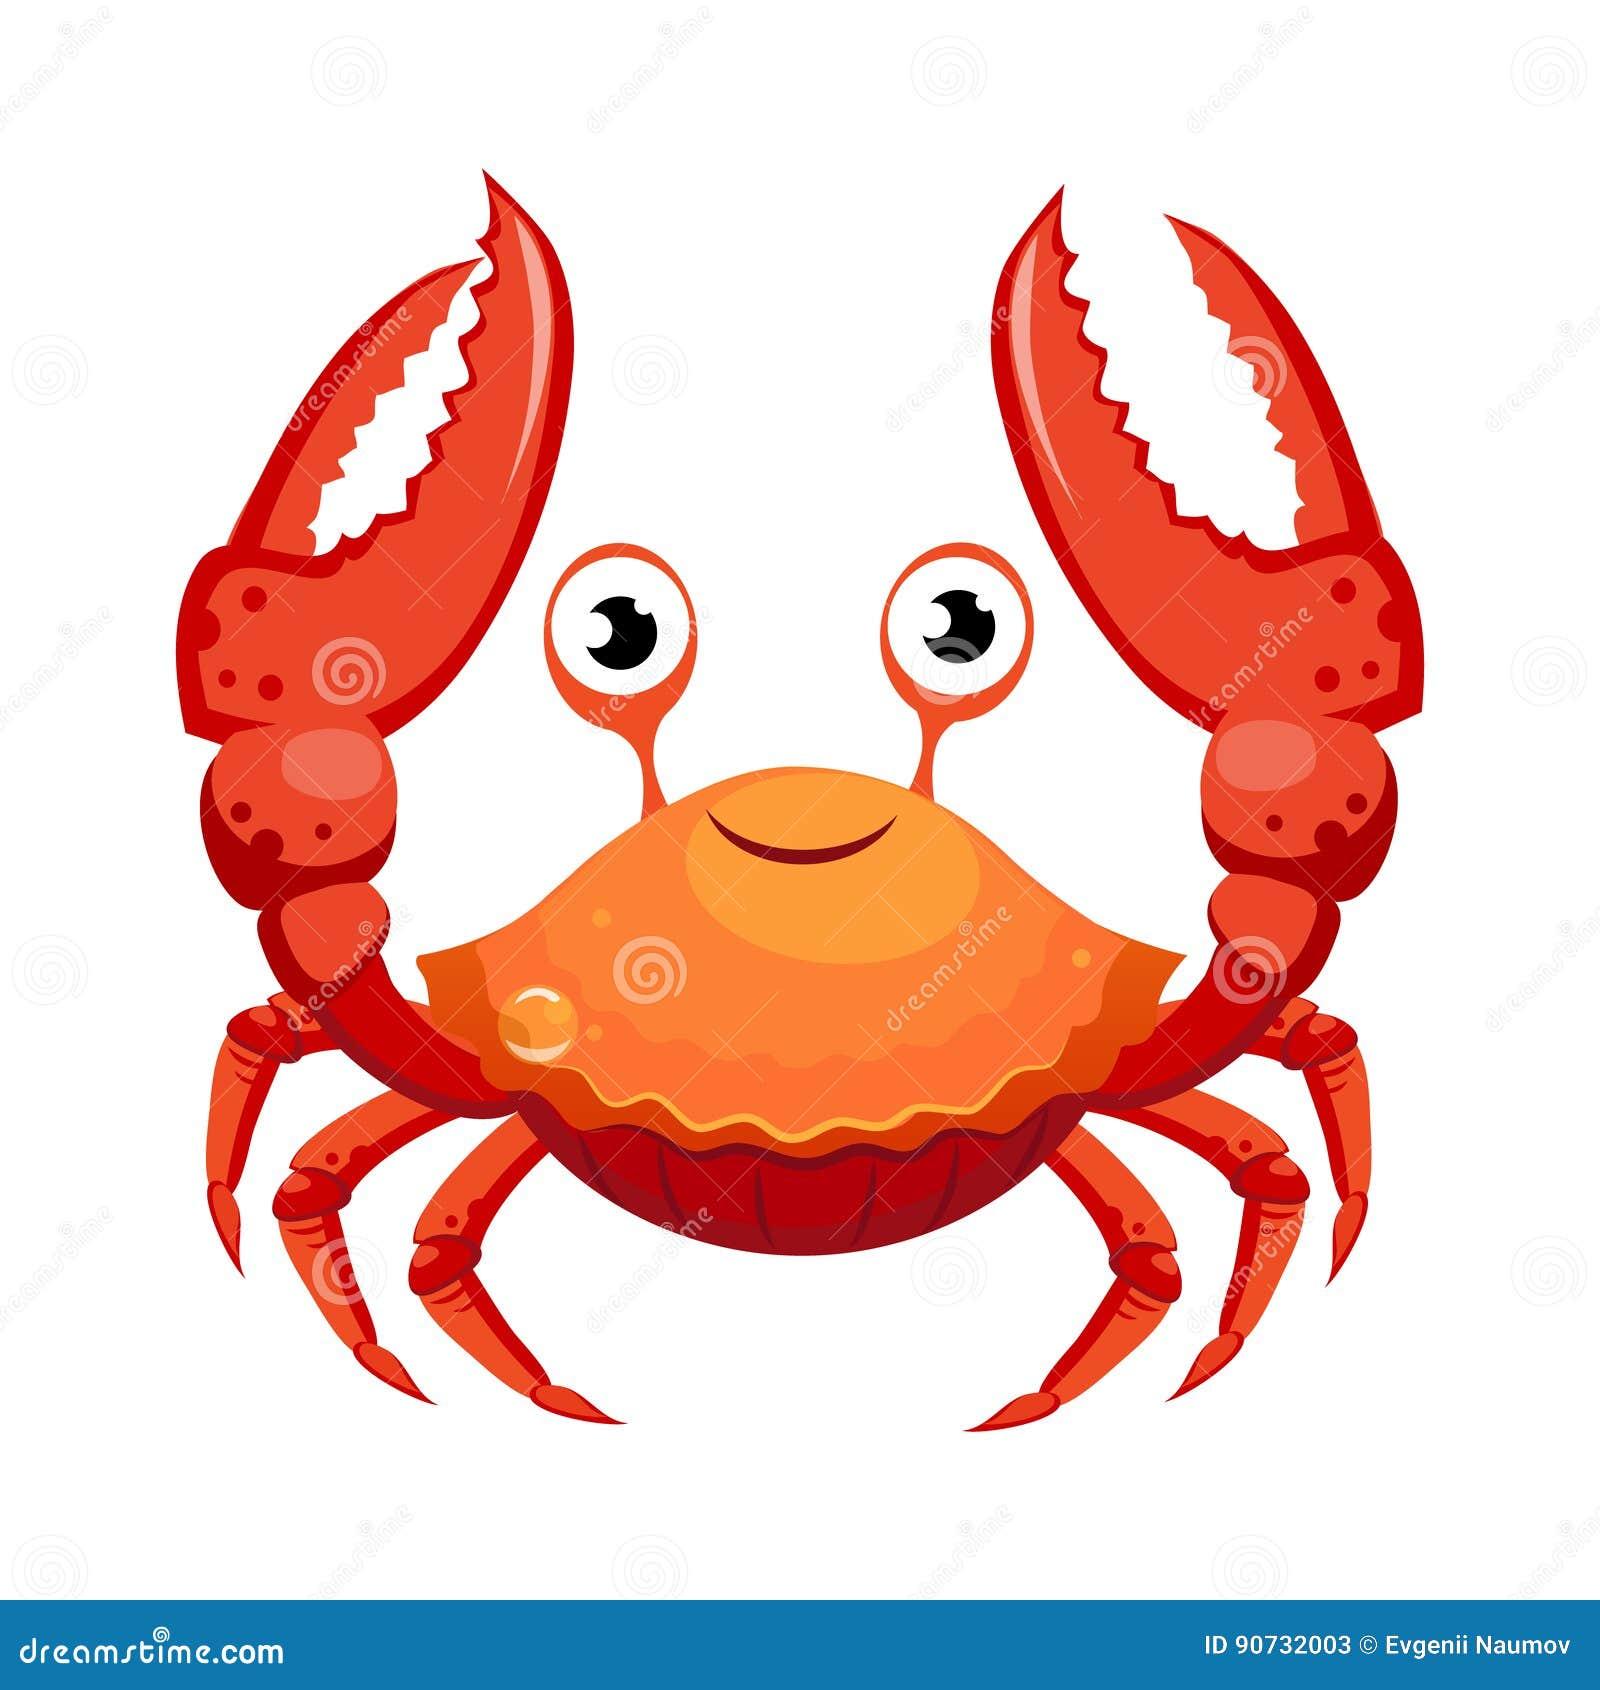 Cangrejo Rojo Criatura Del Mar Personaje De Dibujos Animados